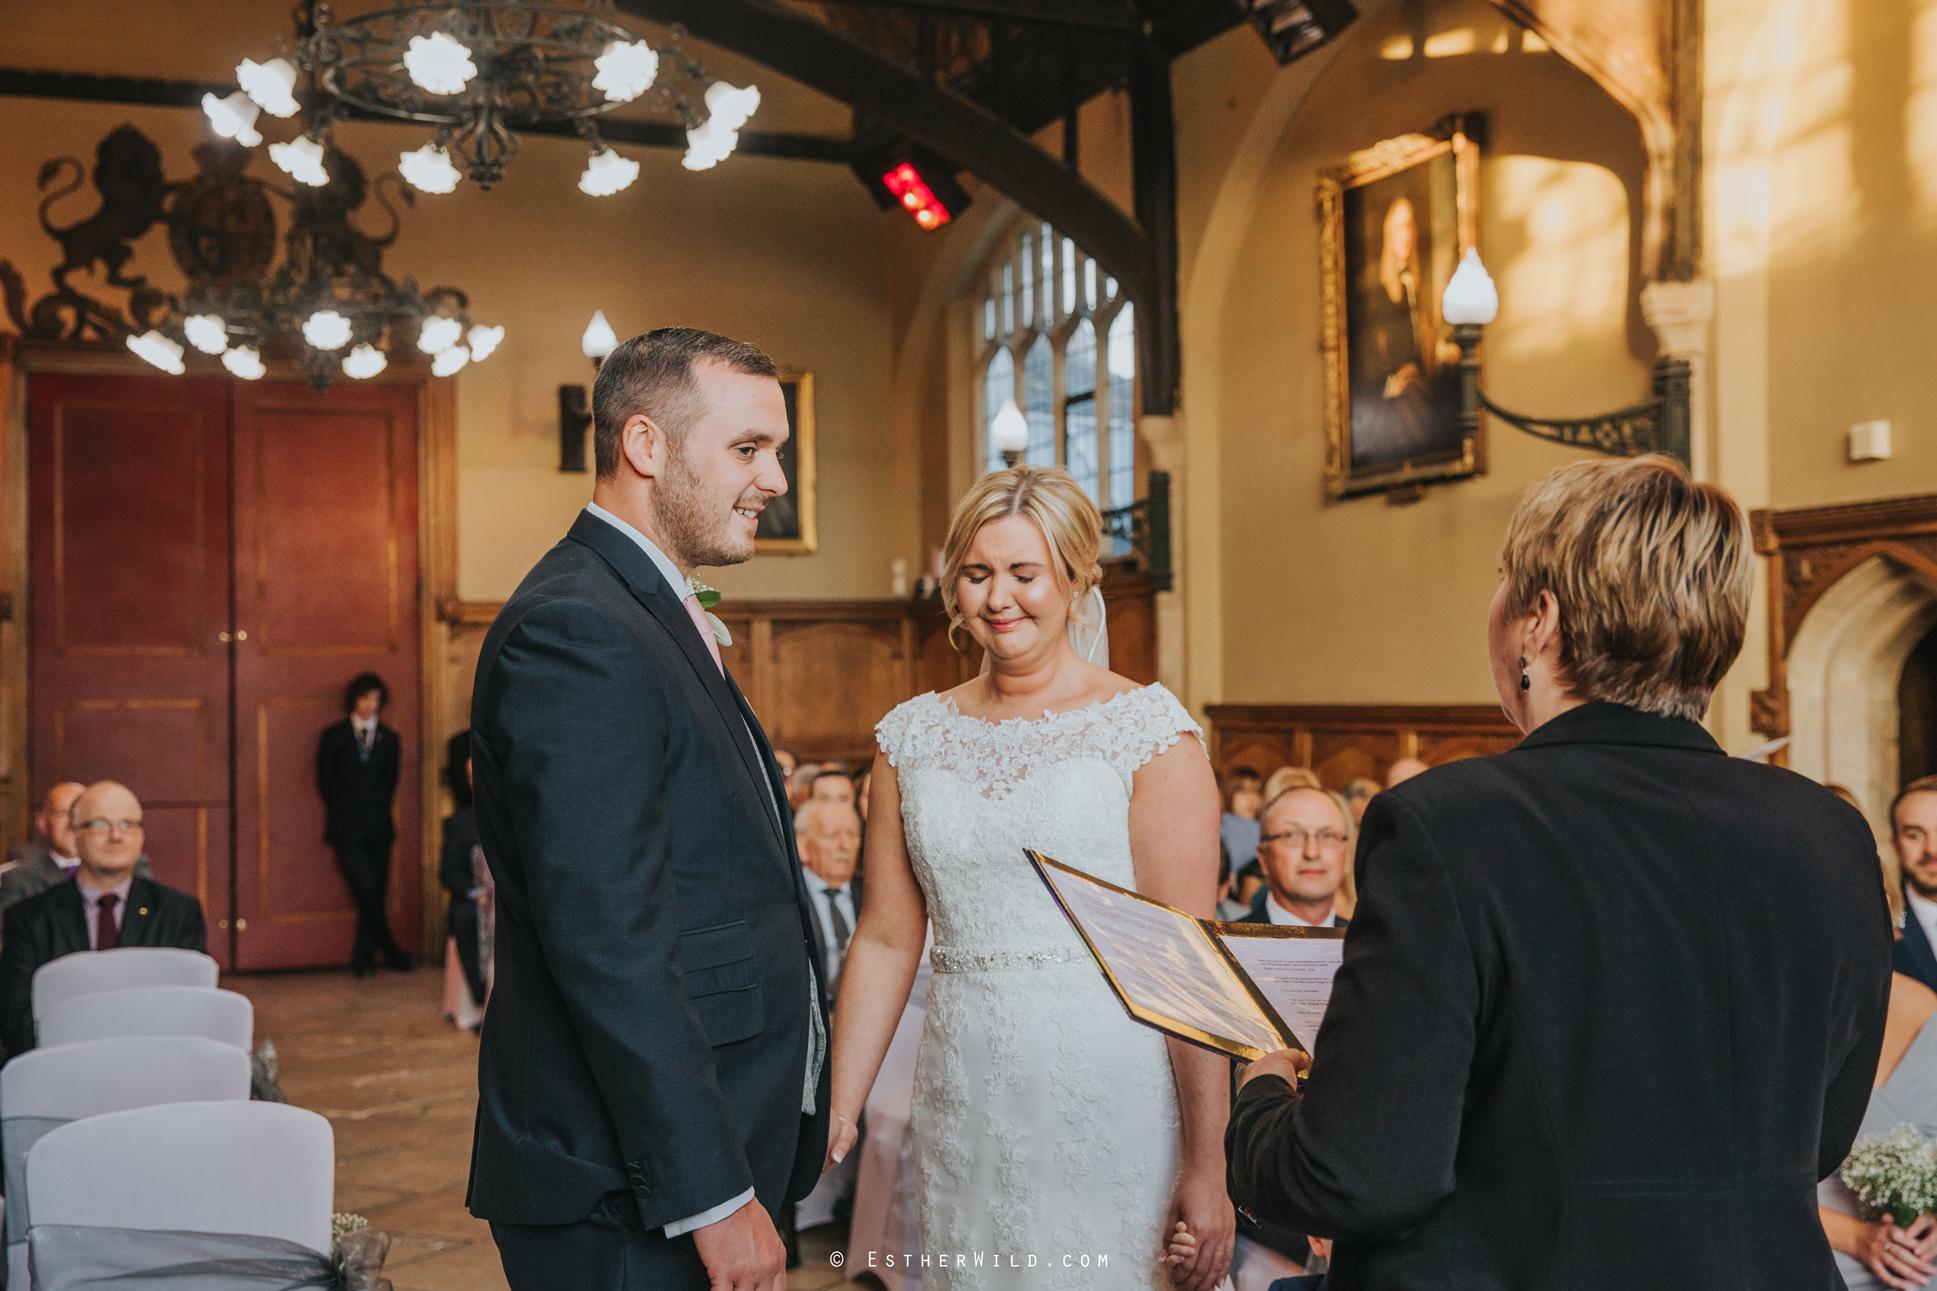 Wedding_Kings_Lynn_Town_Hall_Norfolk_Photographer_Esther_Wild_IMG_0974.jpg